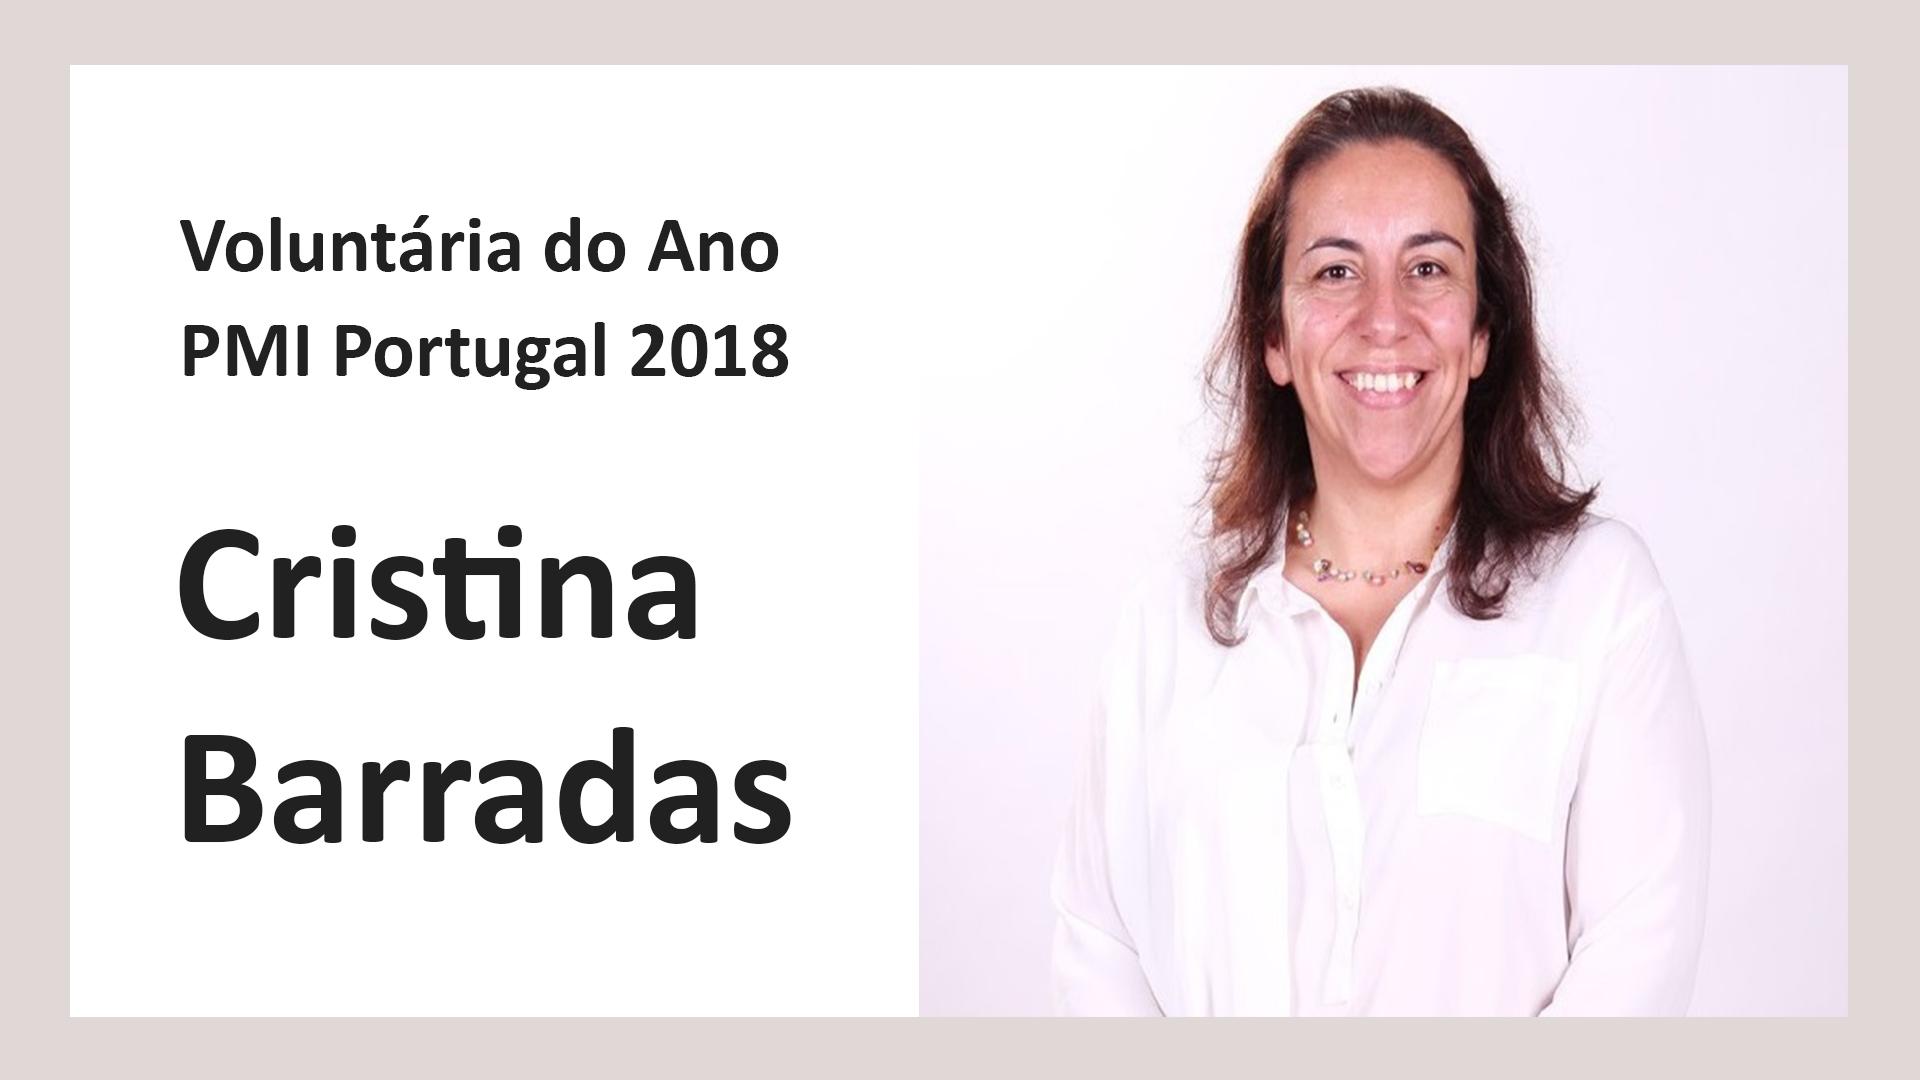 Voluntária do Ano PMI Portugal 2018